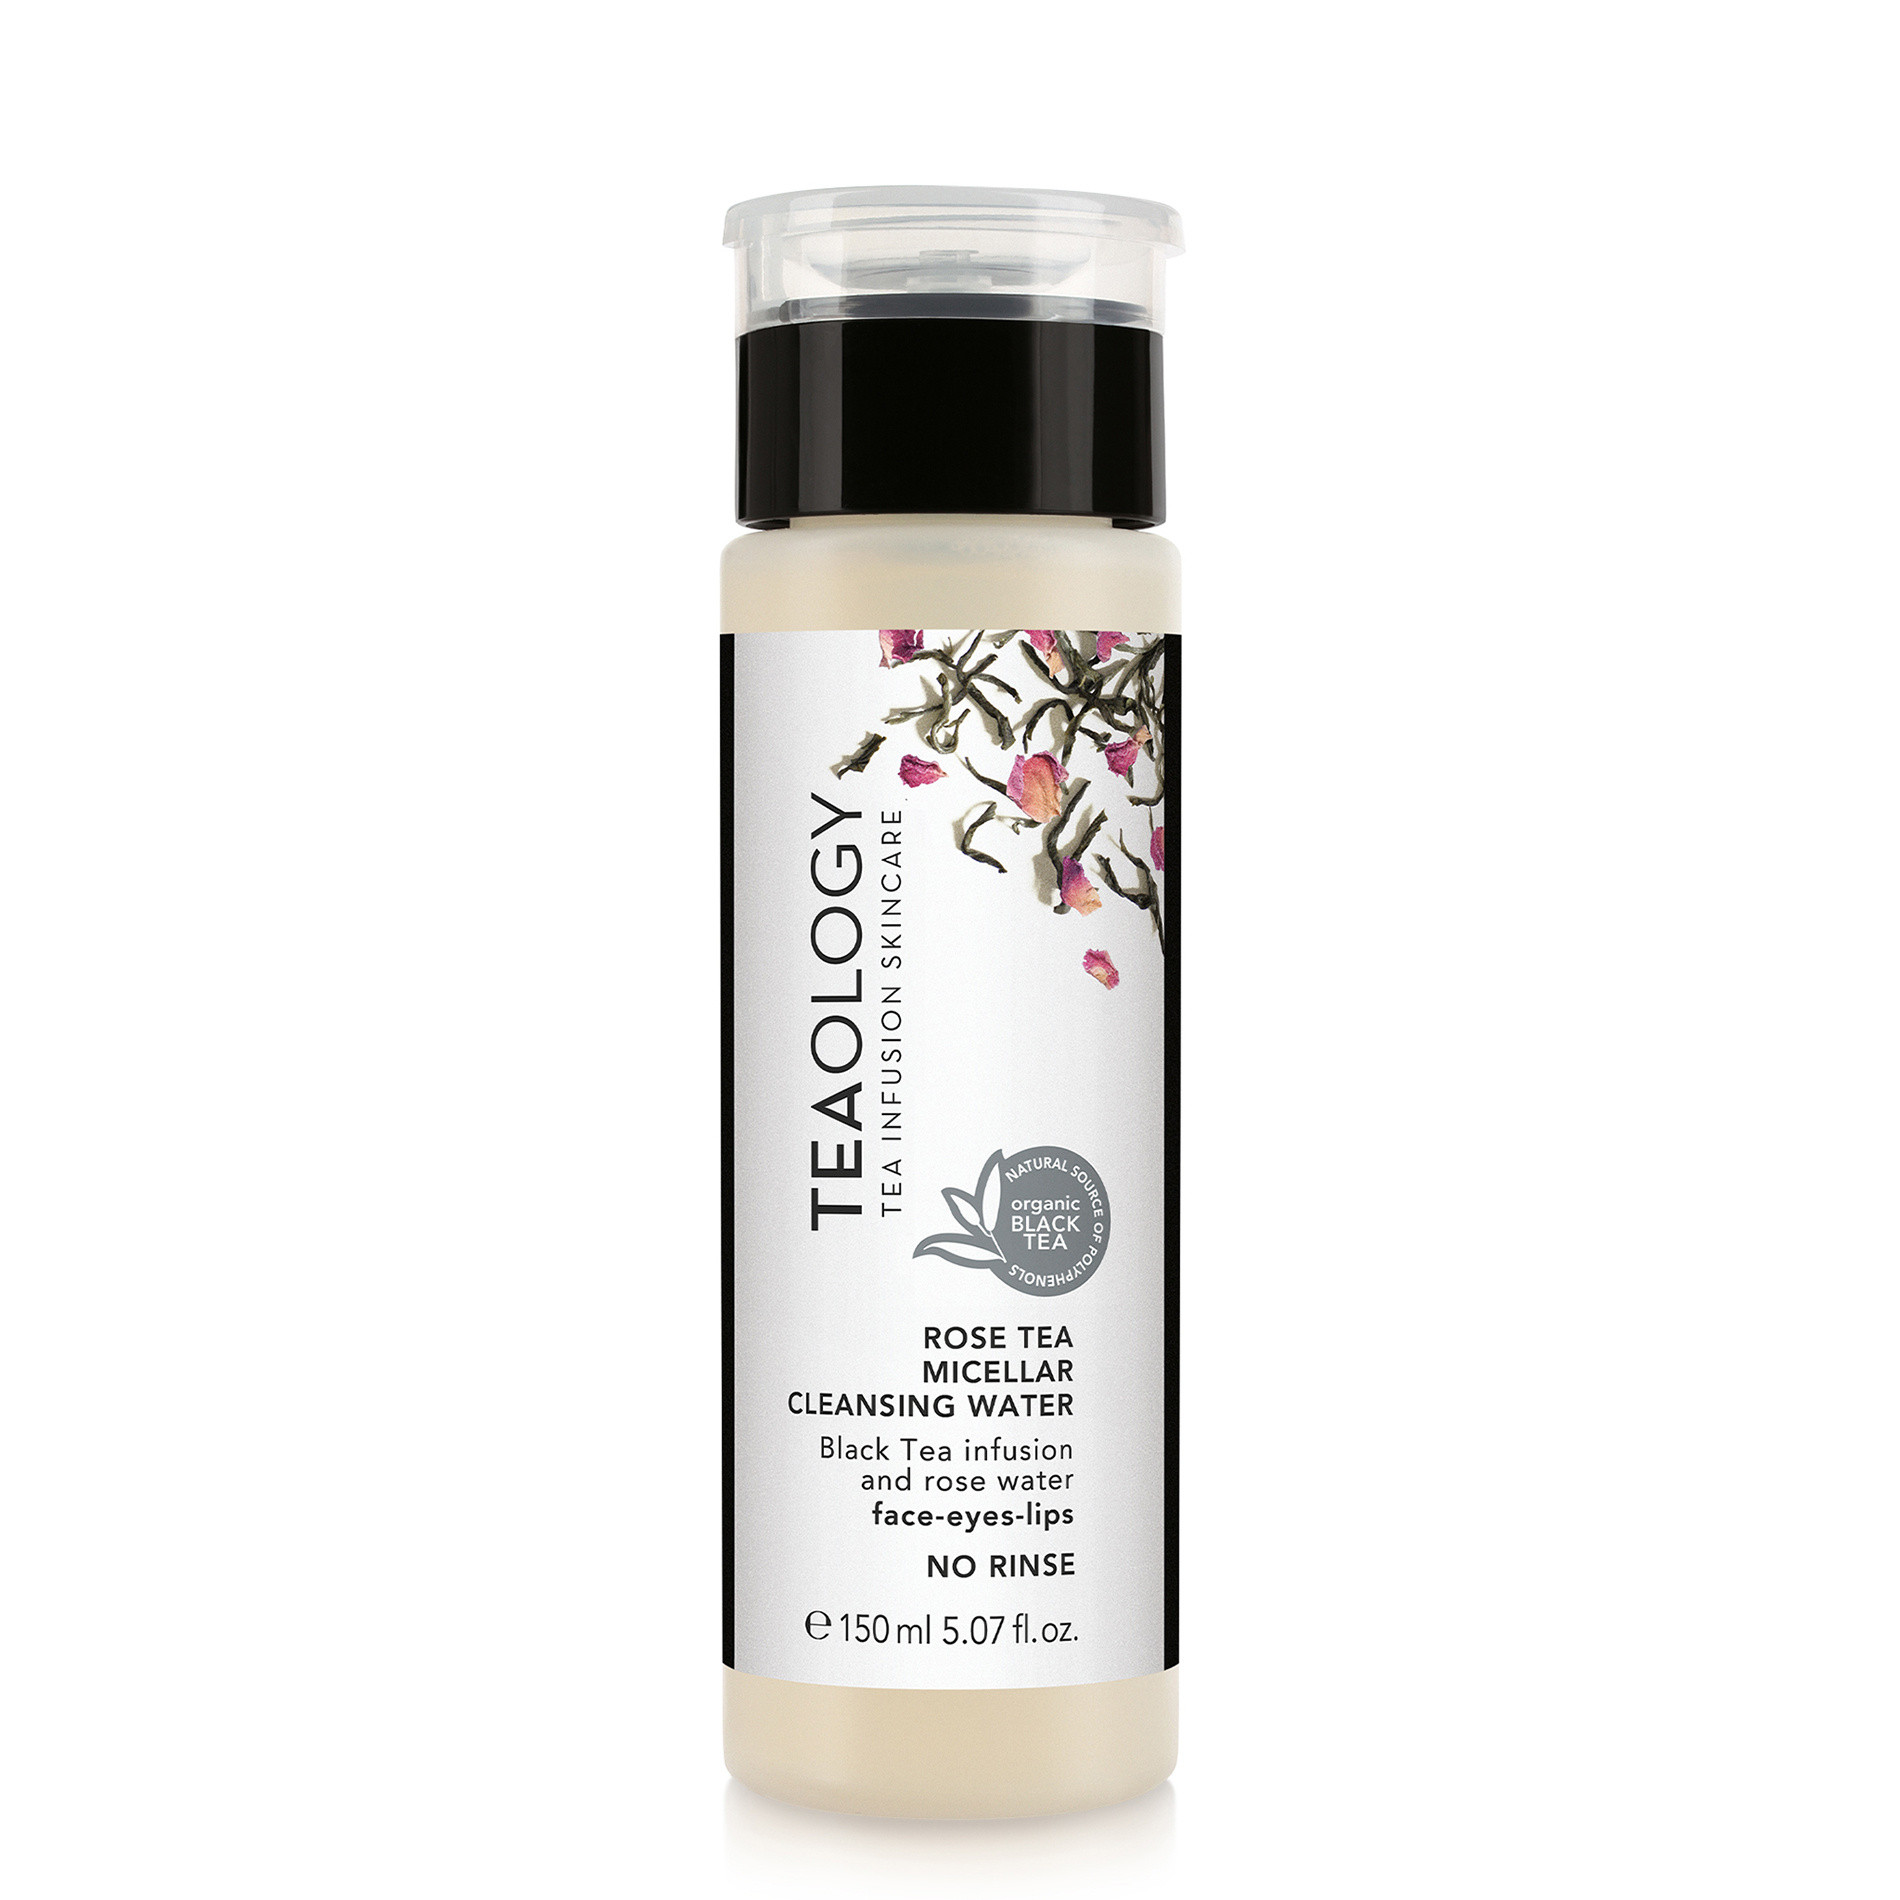 Rose Tea Acqua Micellare 150 ml, Bianco, large image number 0